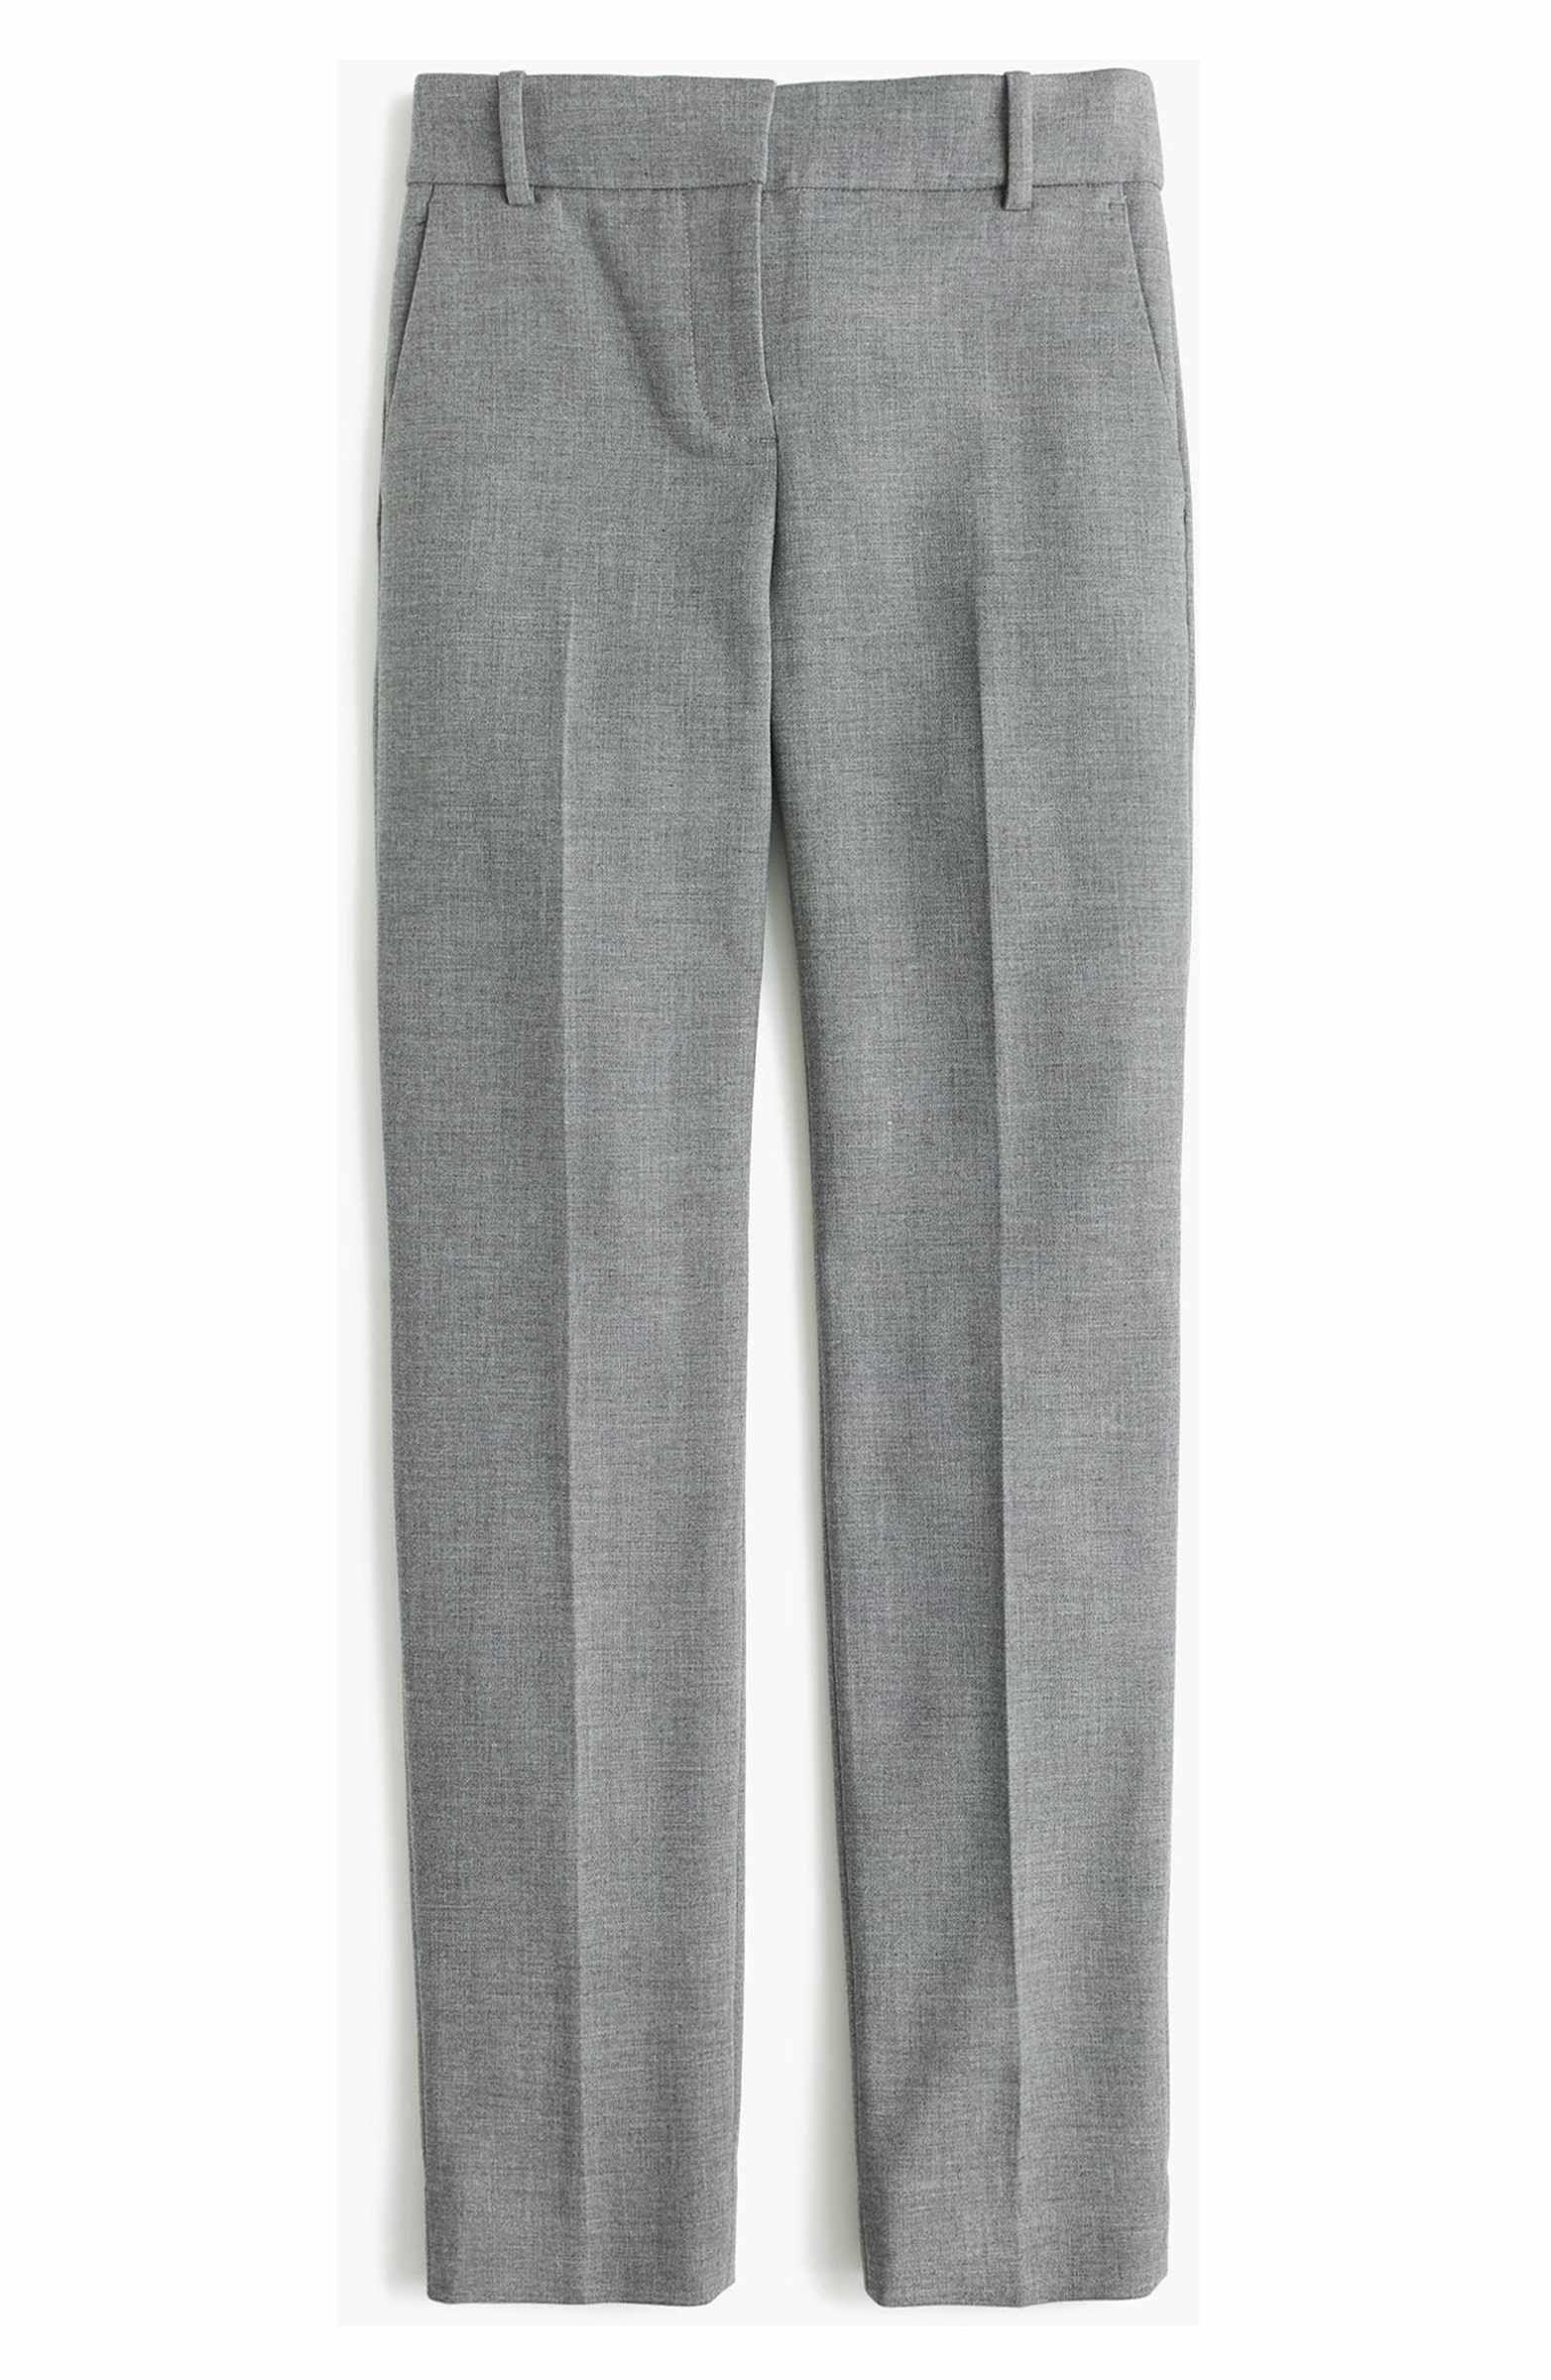 J Four crew Petite Stretches Wardrobes Crop Cameron And Season Pants 6Hrw6qZ